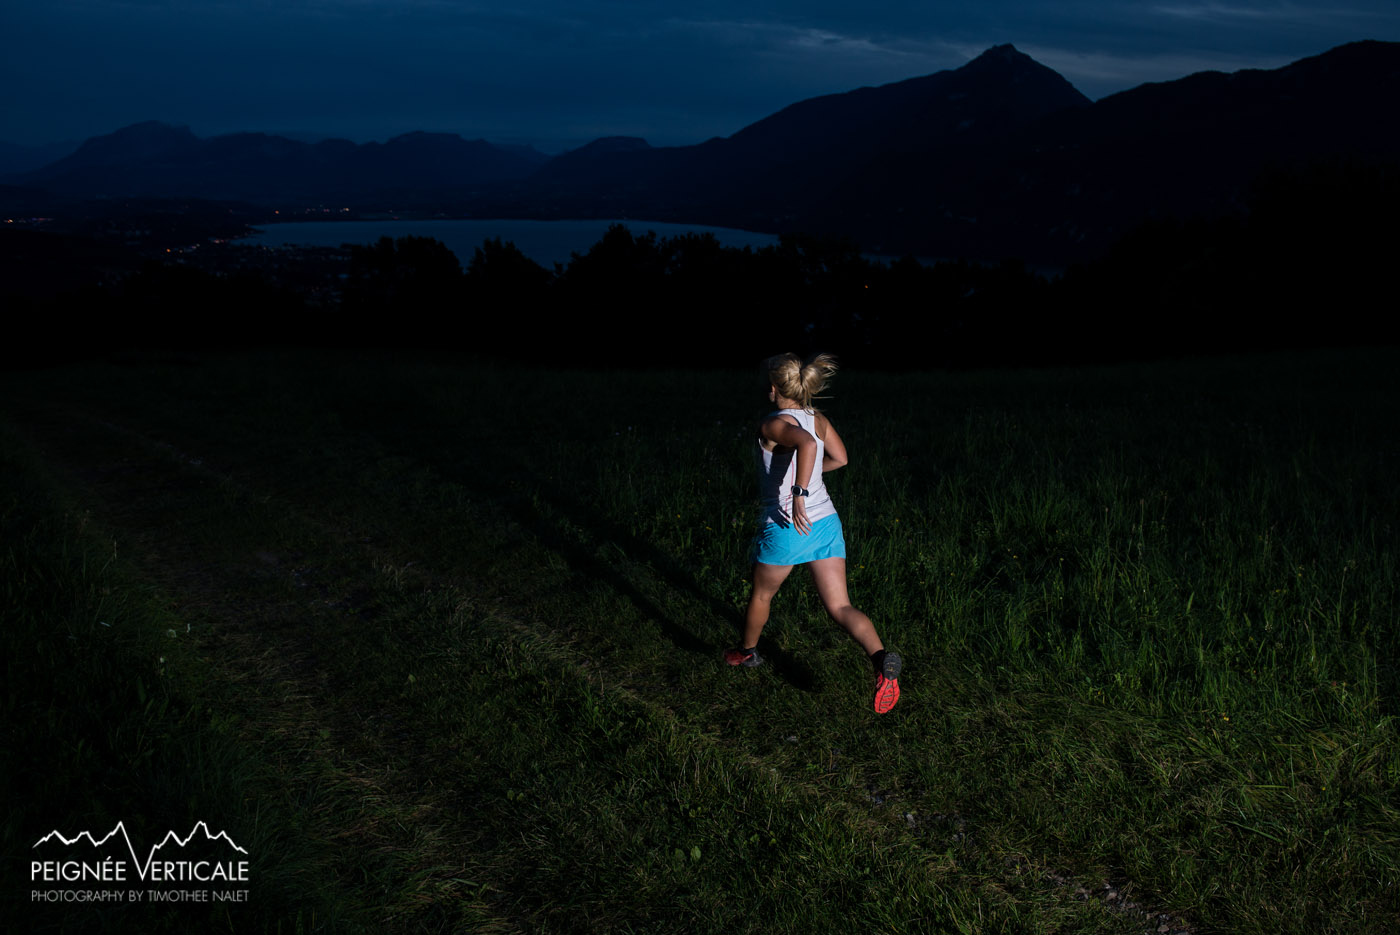 Timothee-Nalet-Laurie-Renoton-Running-night-5622.jpg